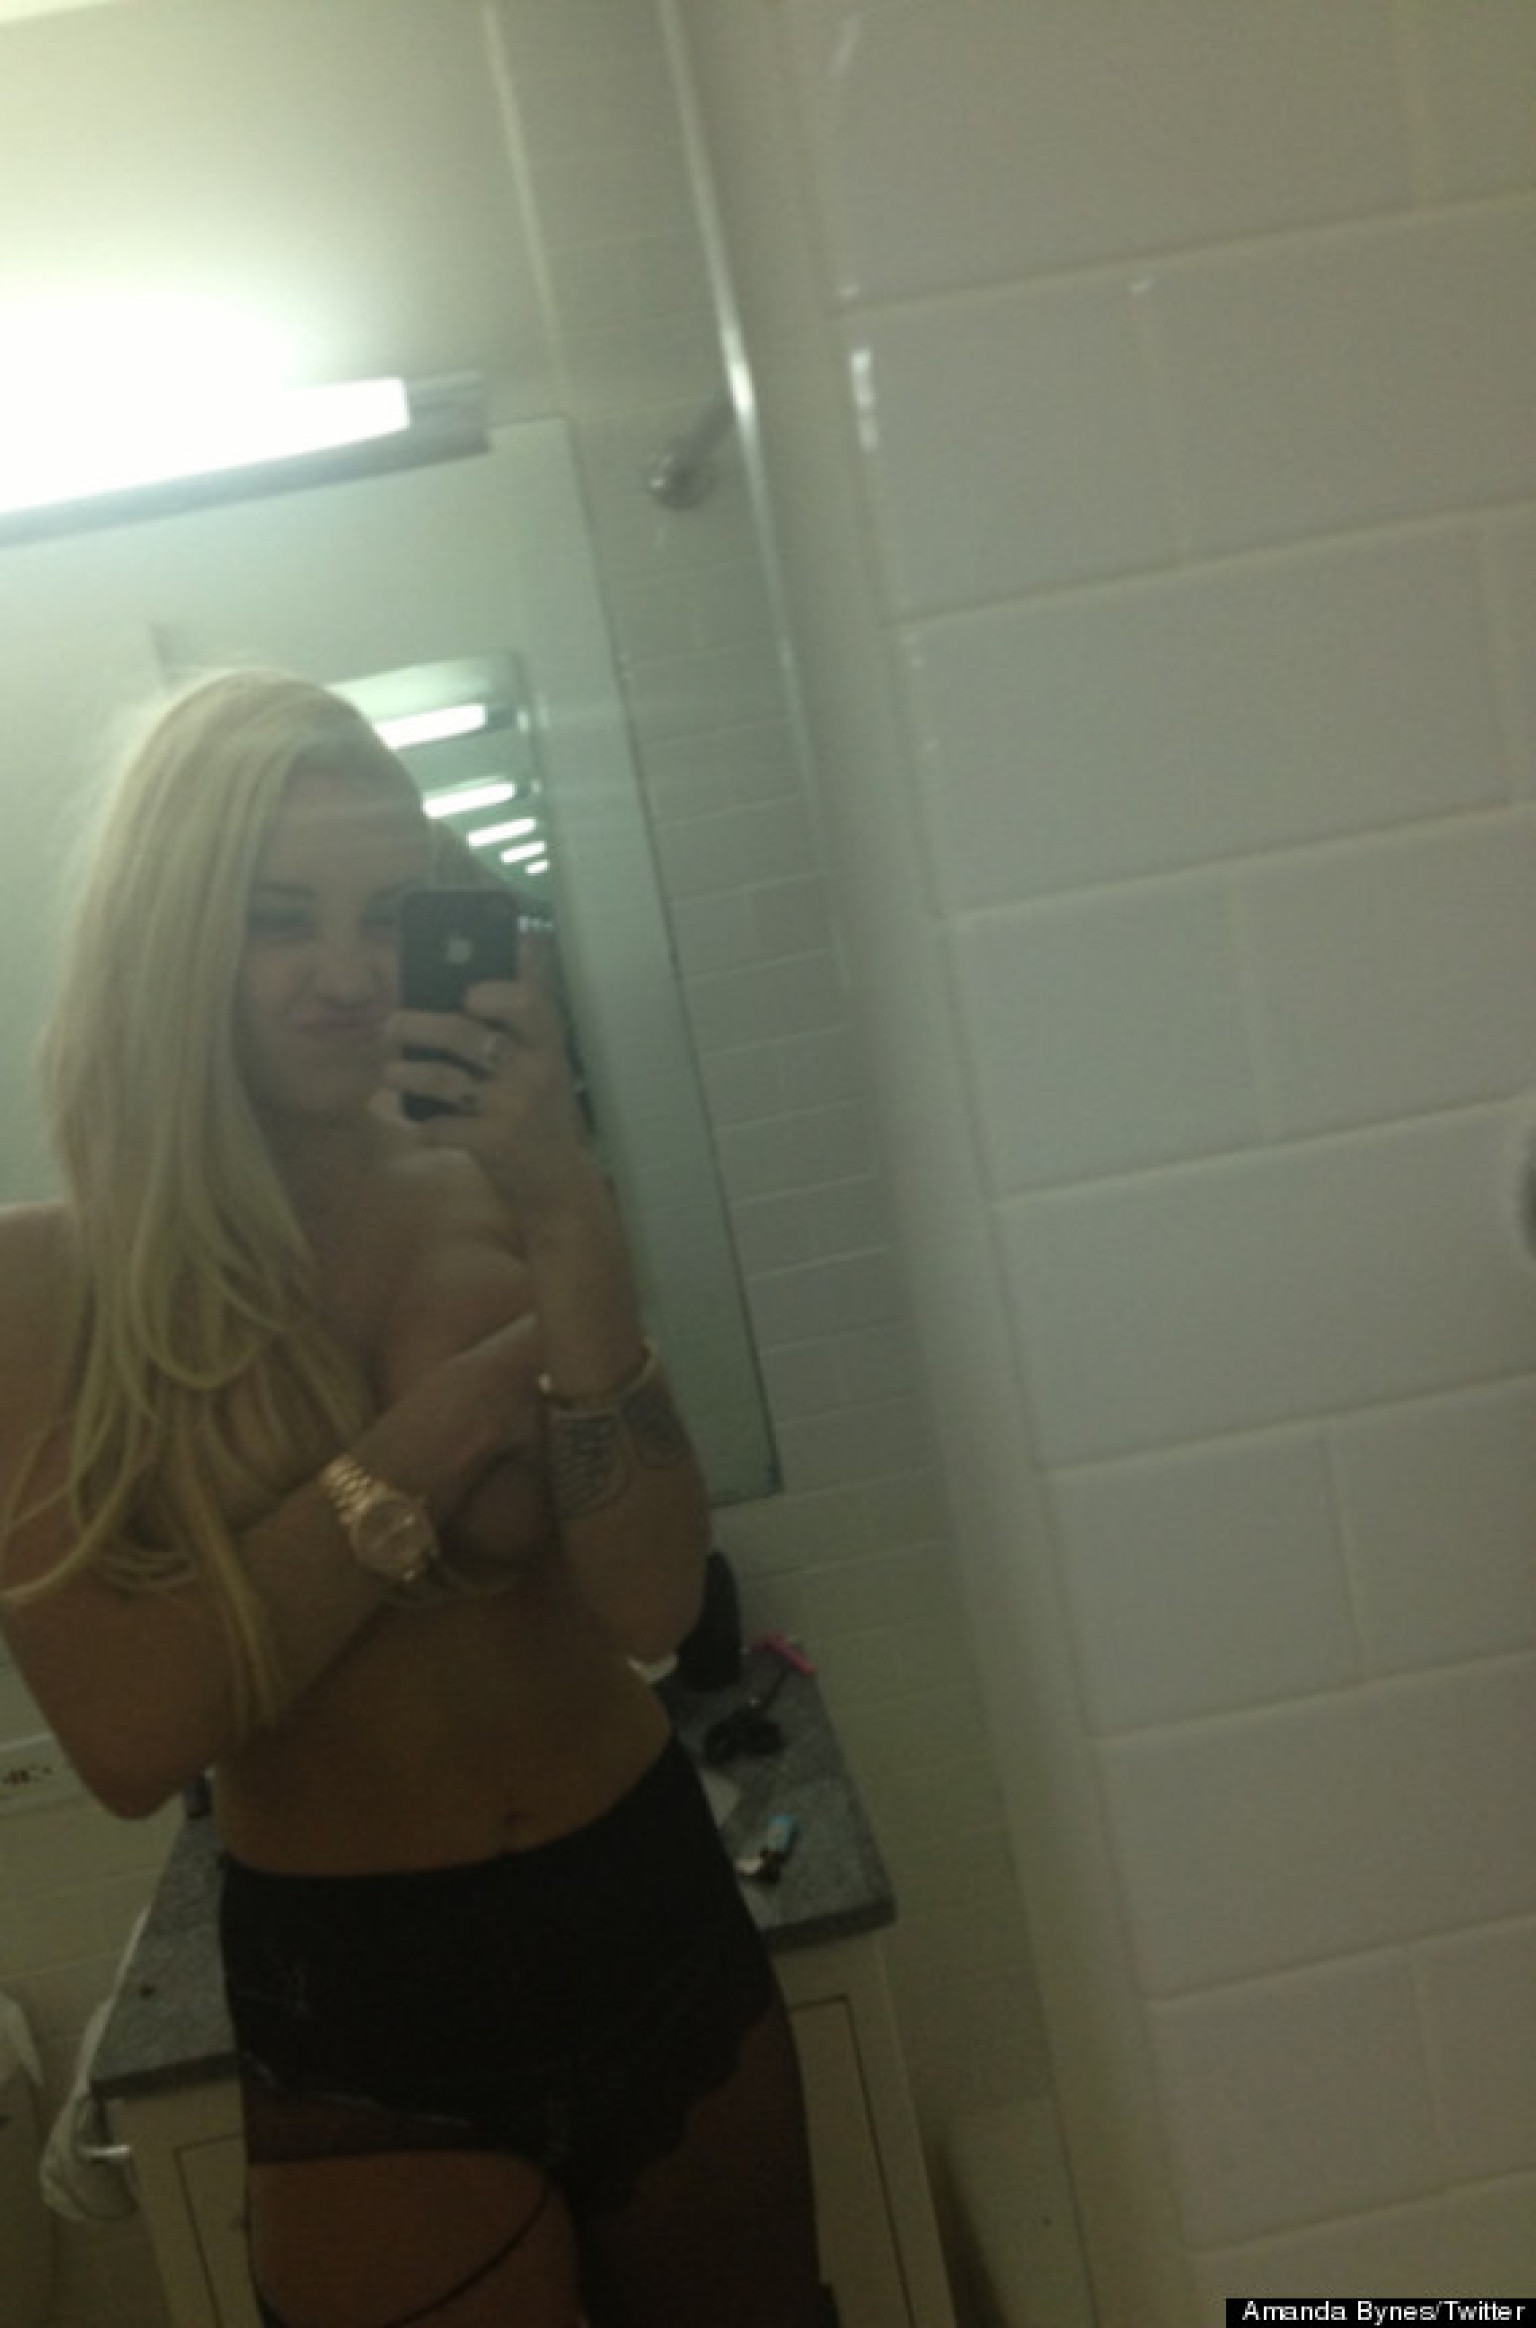 Amanda bynes fake nude pics 6